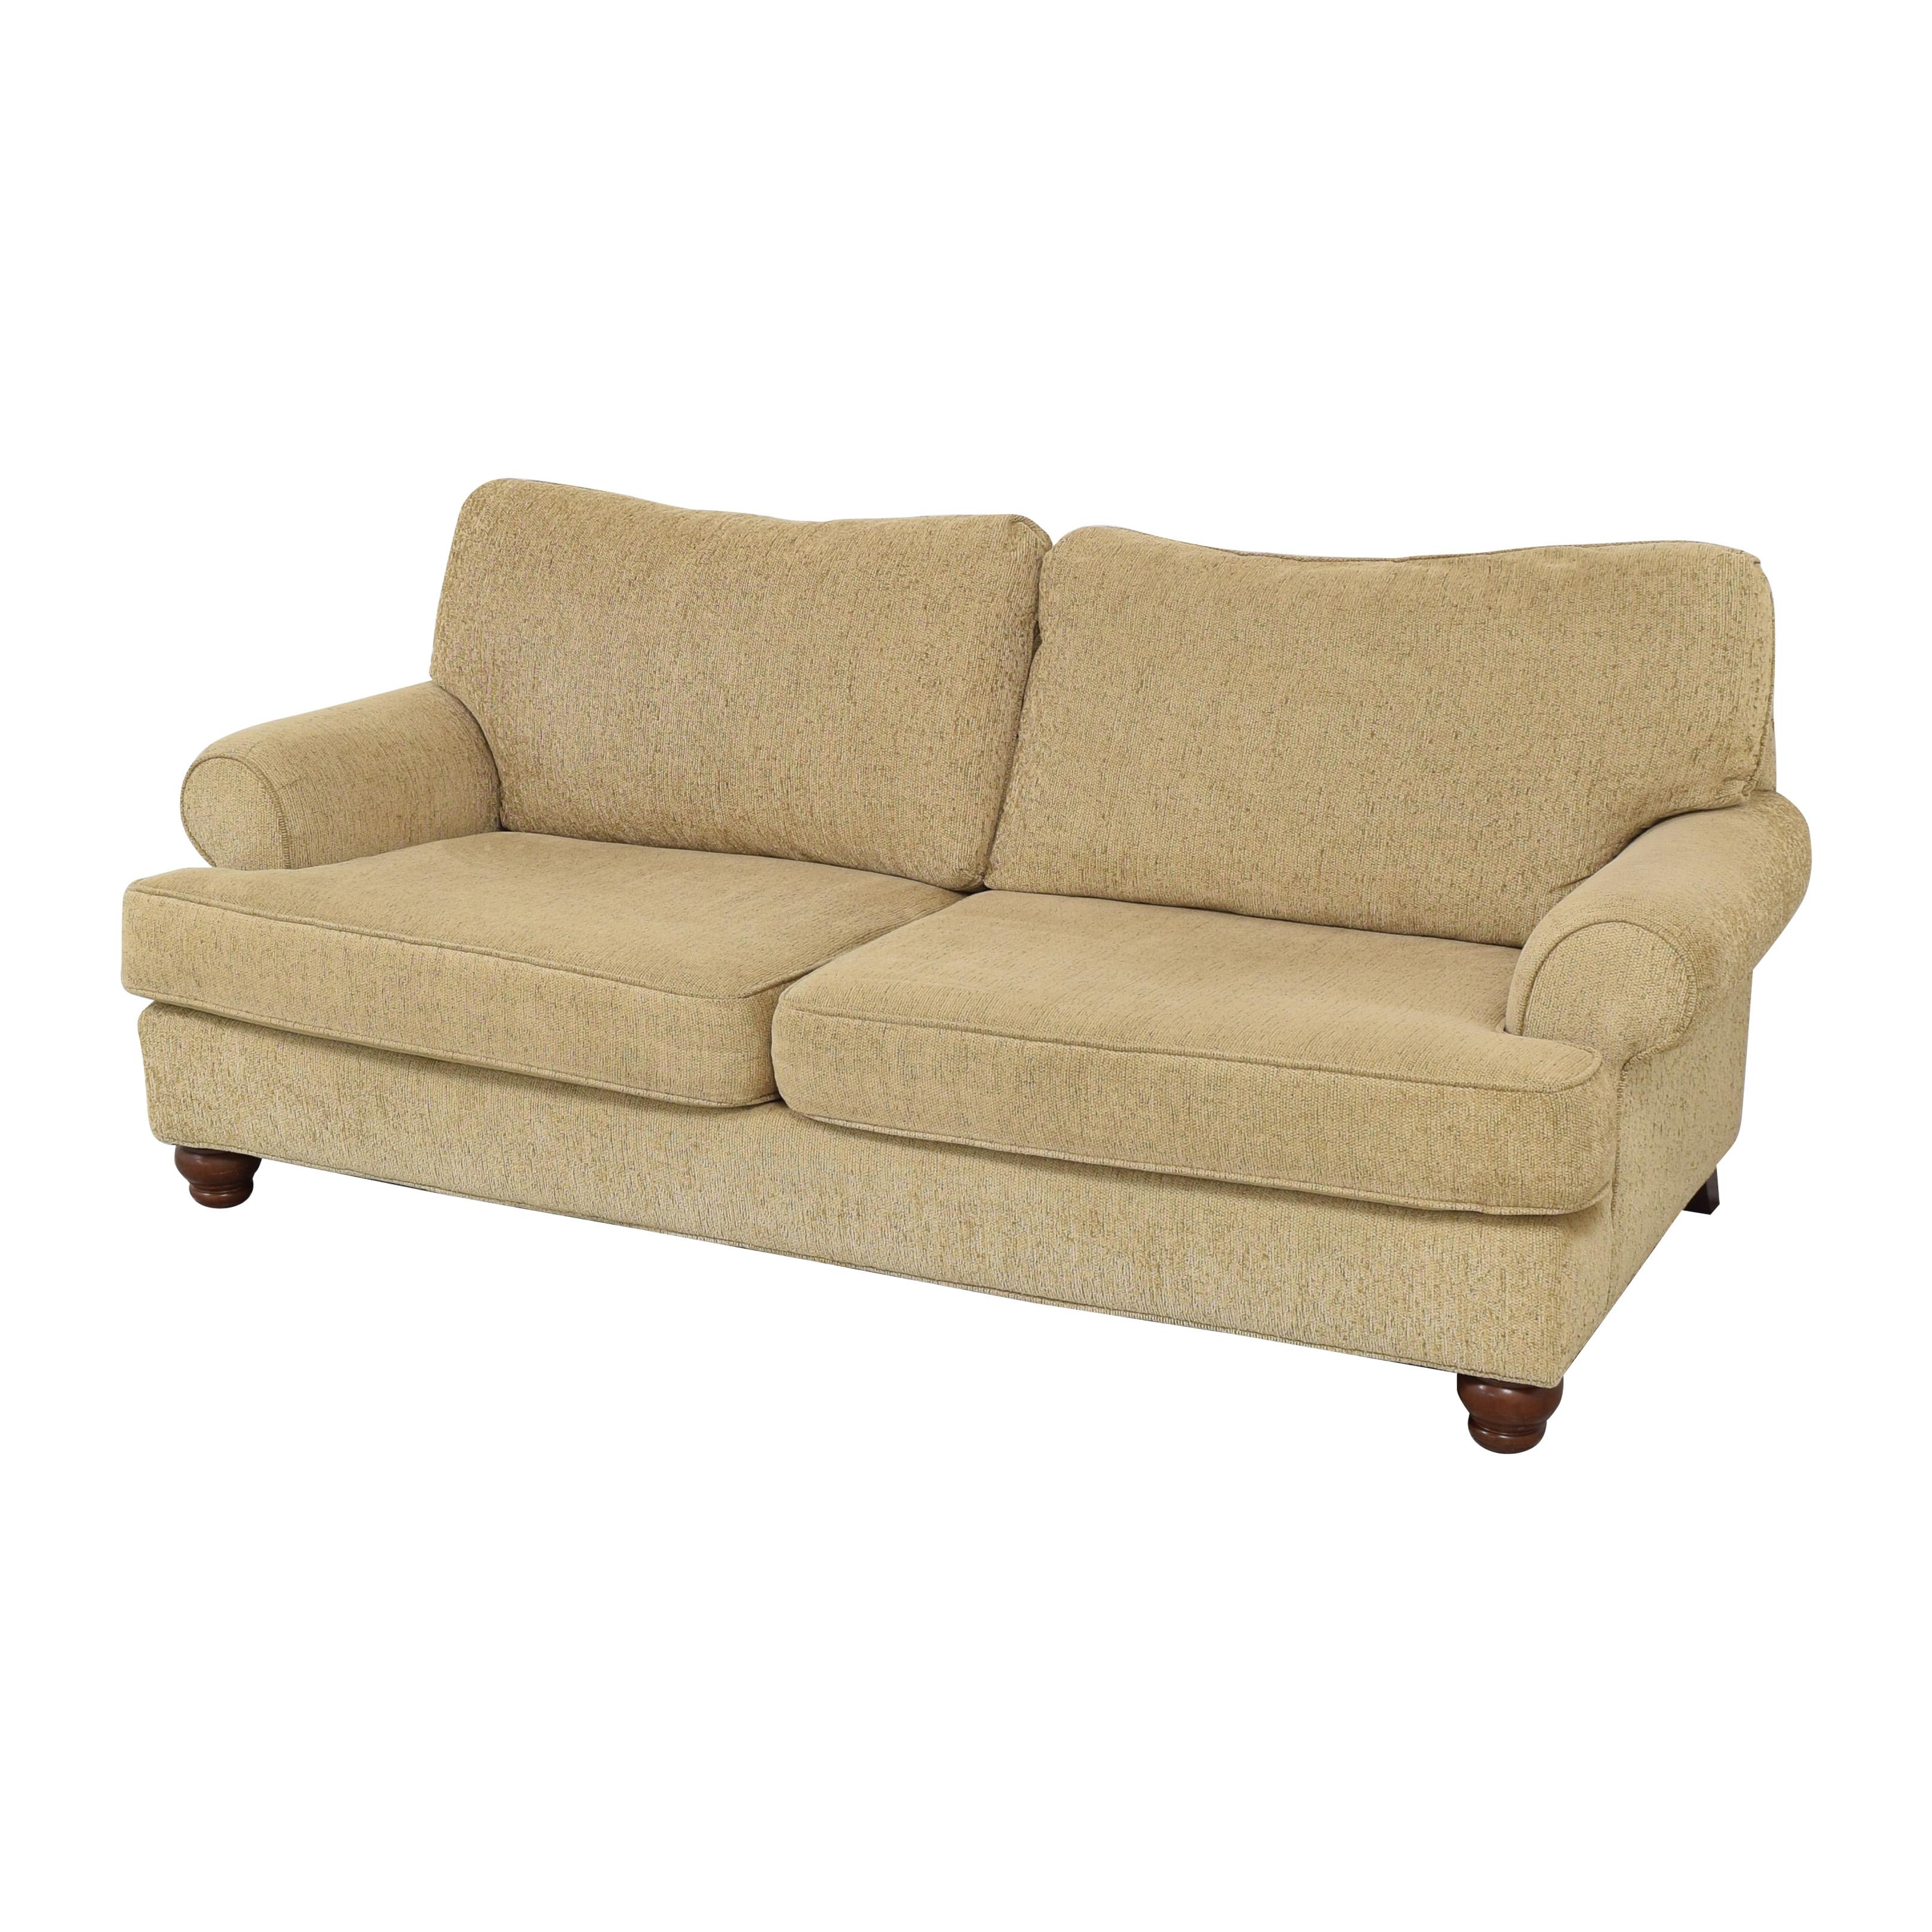 Craftmaster Furniture Craftmaster Furniture Two Cushion Sofa ct